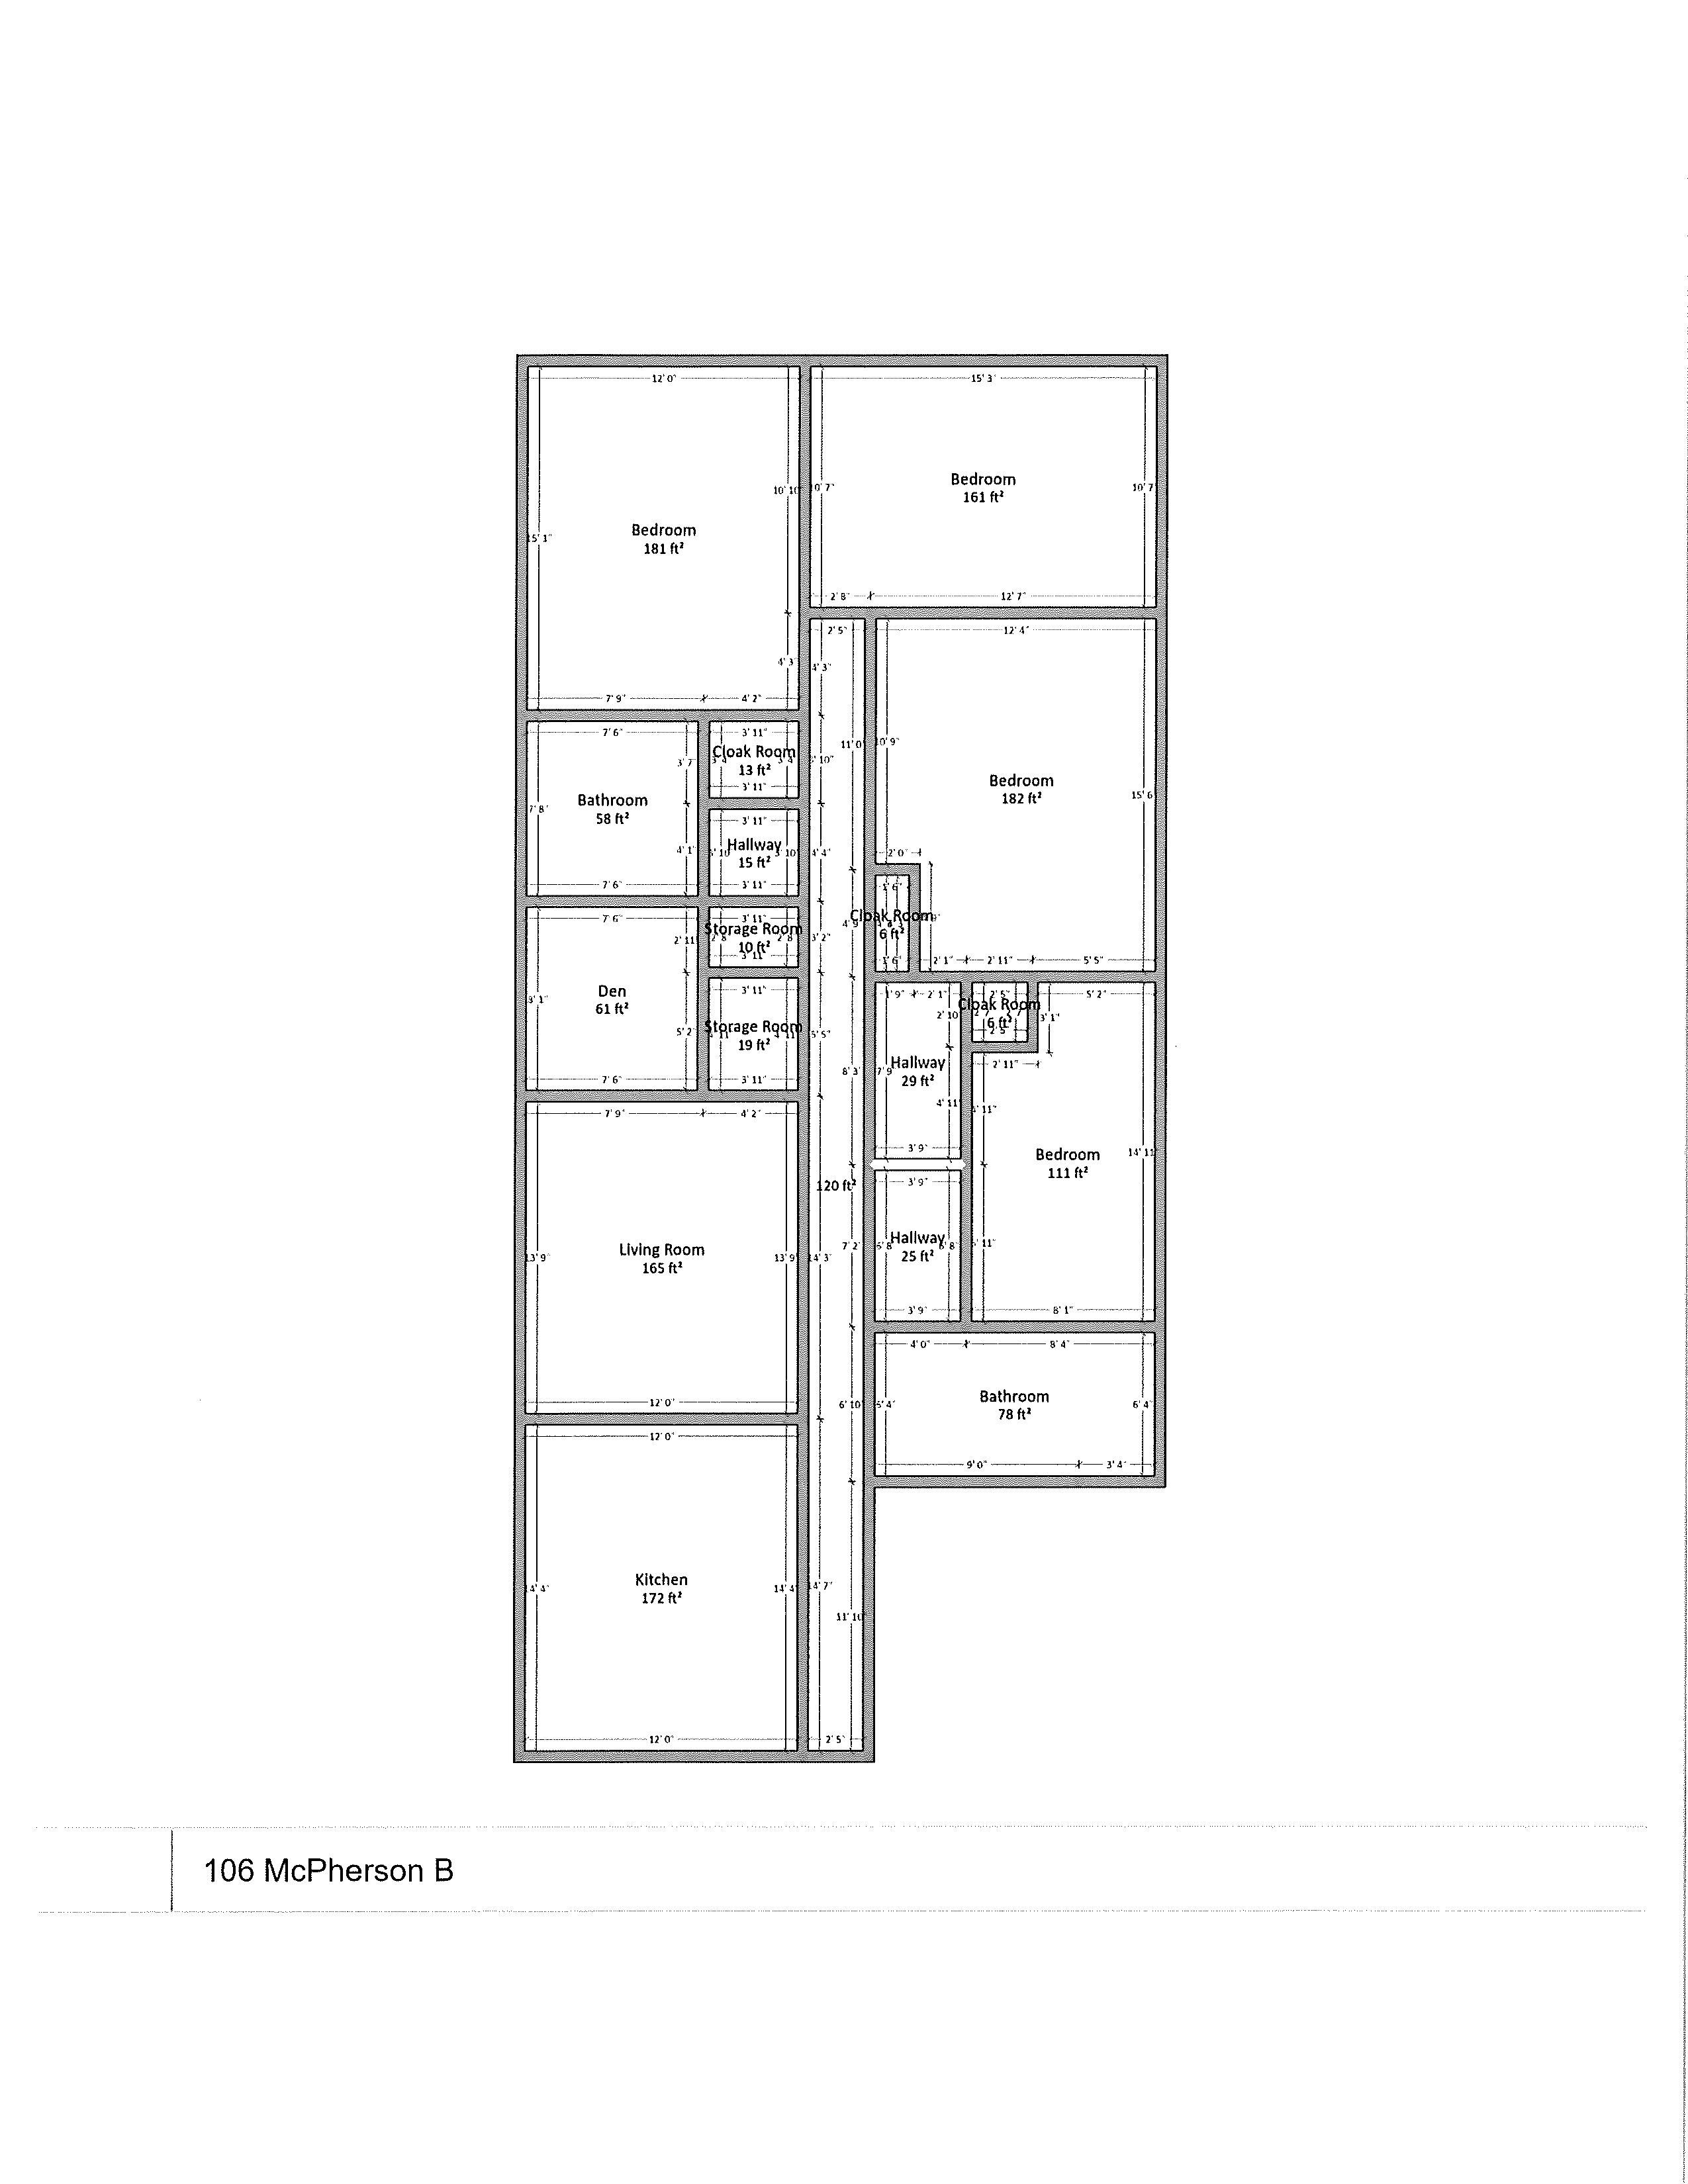 106 mcpherson b floorplan